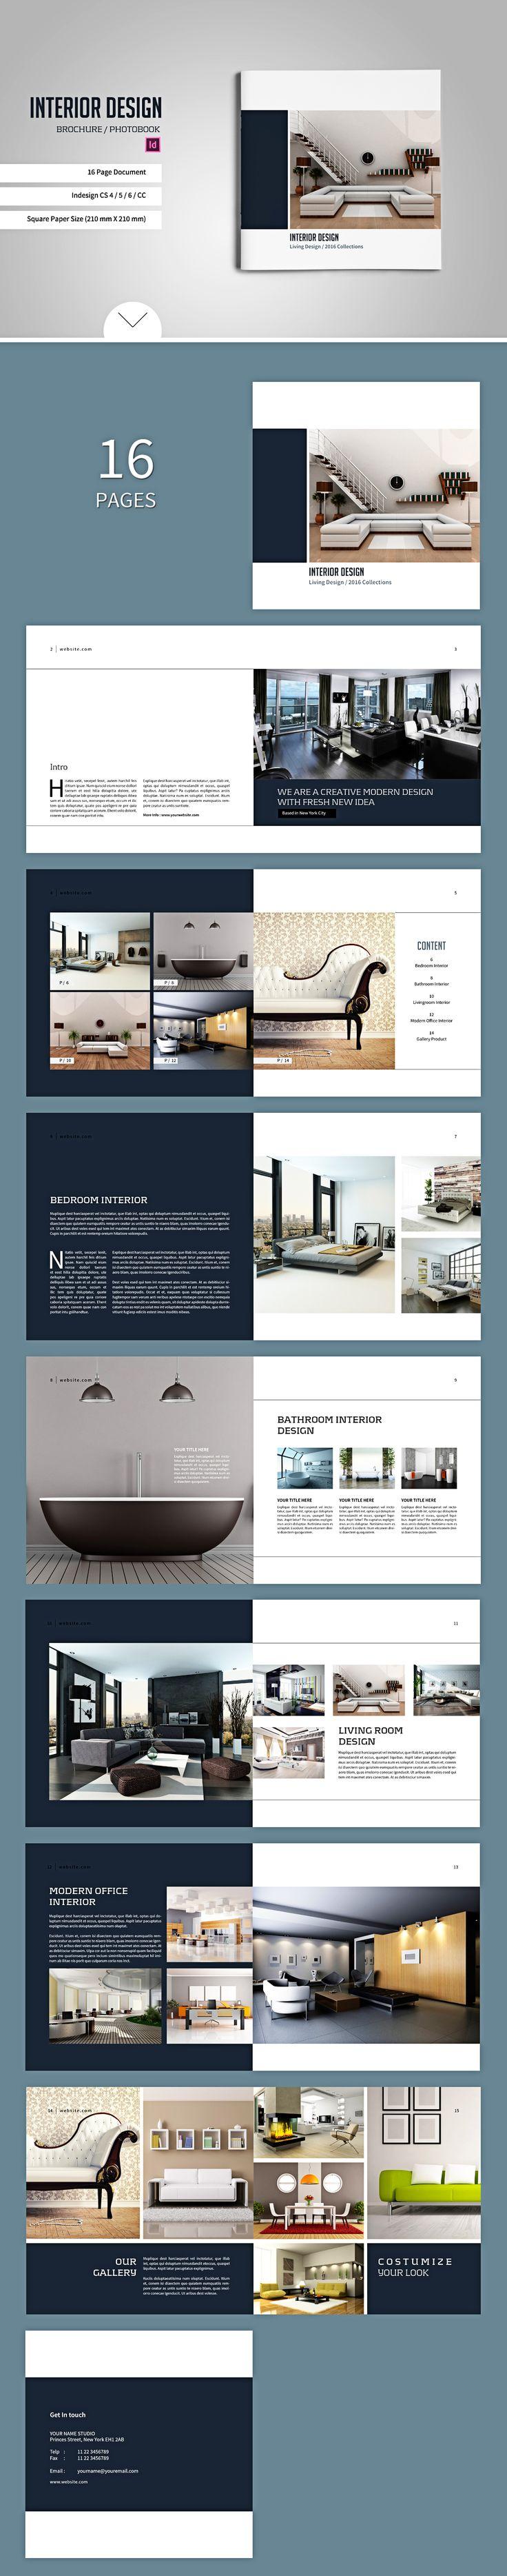 Square Brochure / Catalogs by tujuhbenua on @creativemarket